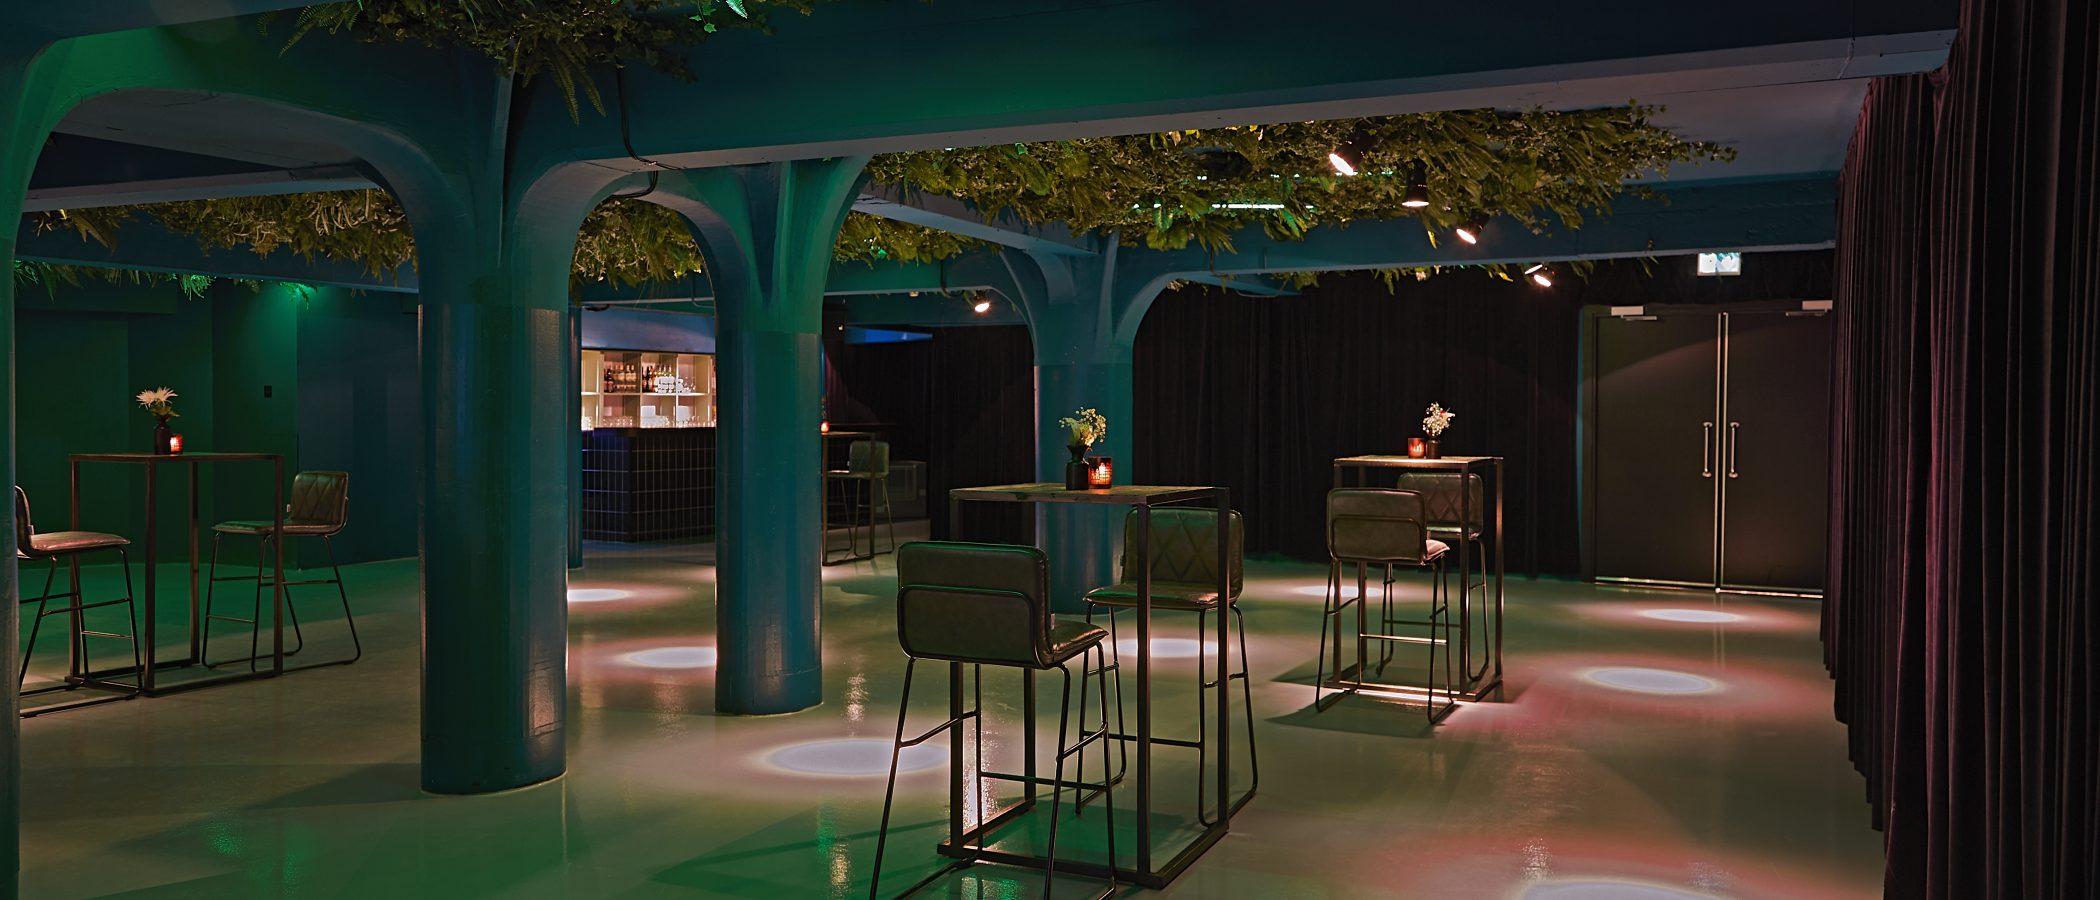 The Club bij Gooiland in Hilversum